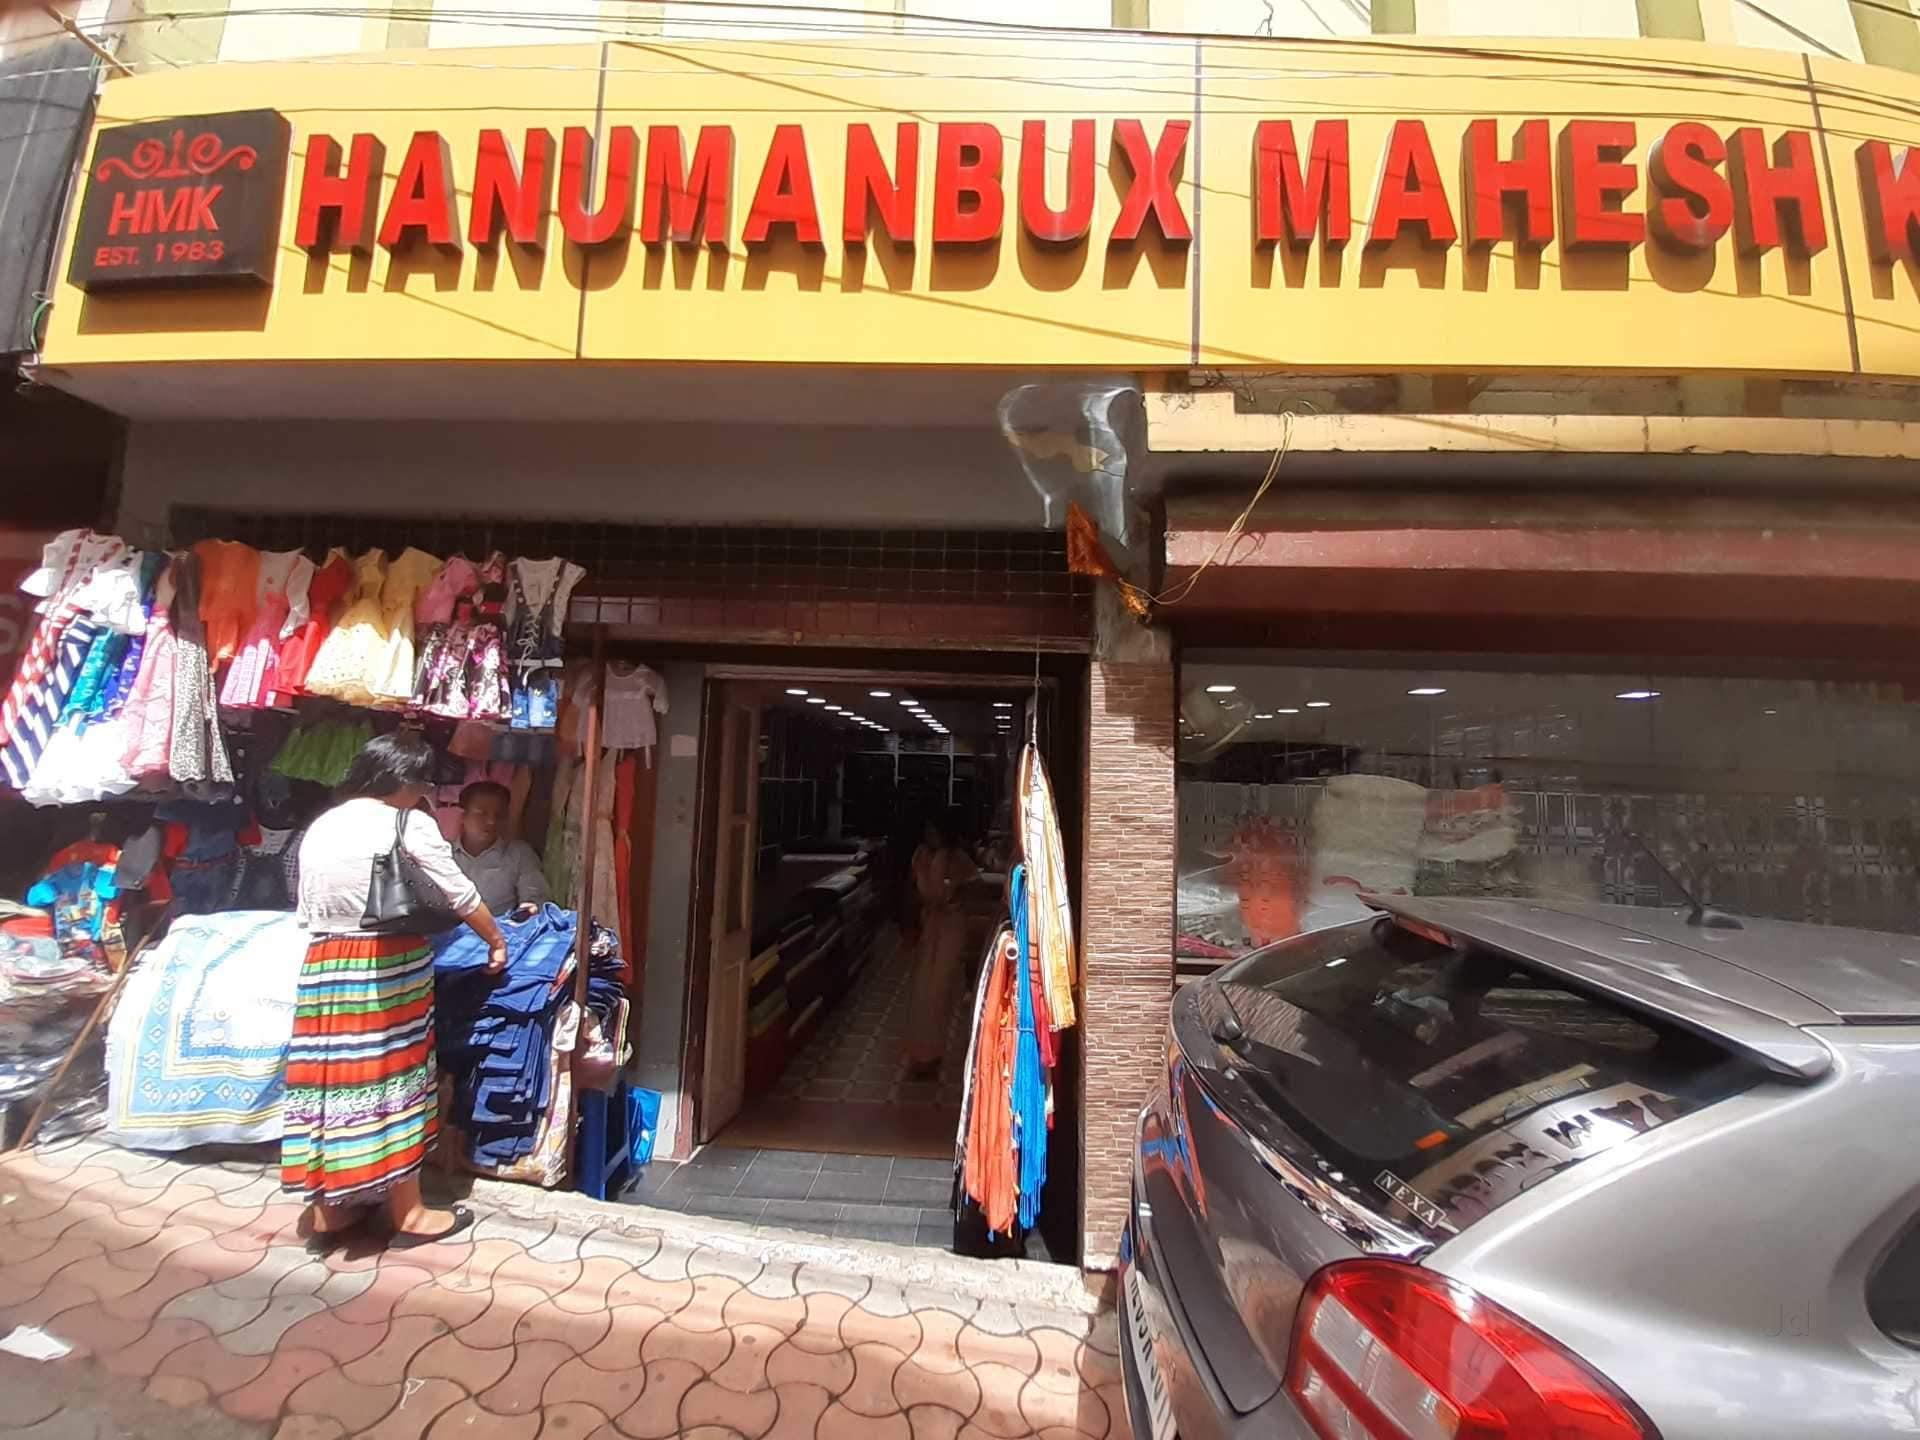 Hanumanbux Mahesh Kumar - Best Places To Shop In Shillong To Explore The City